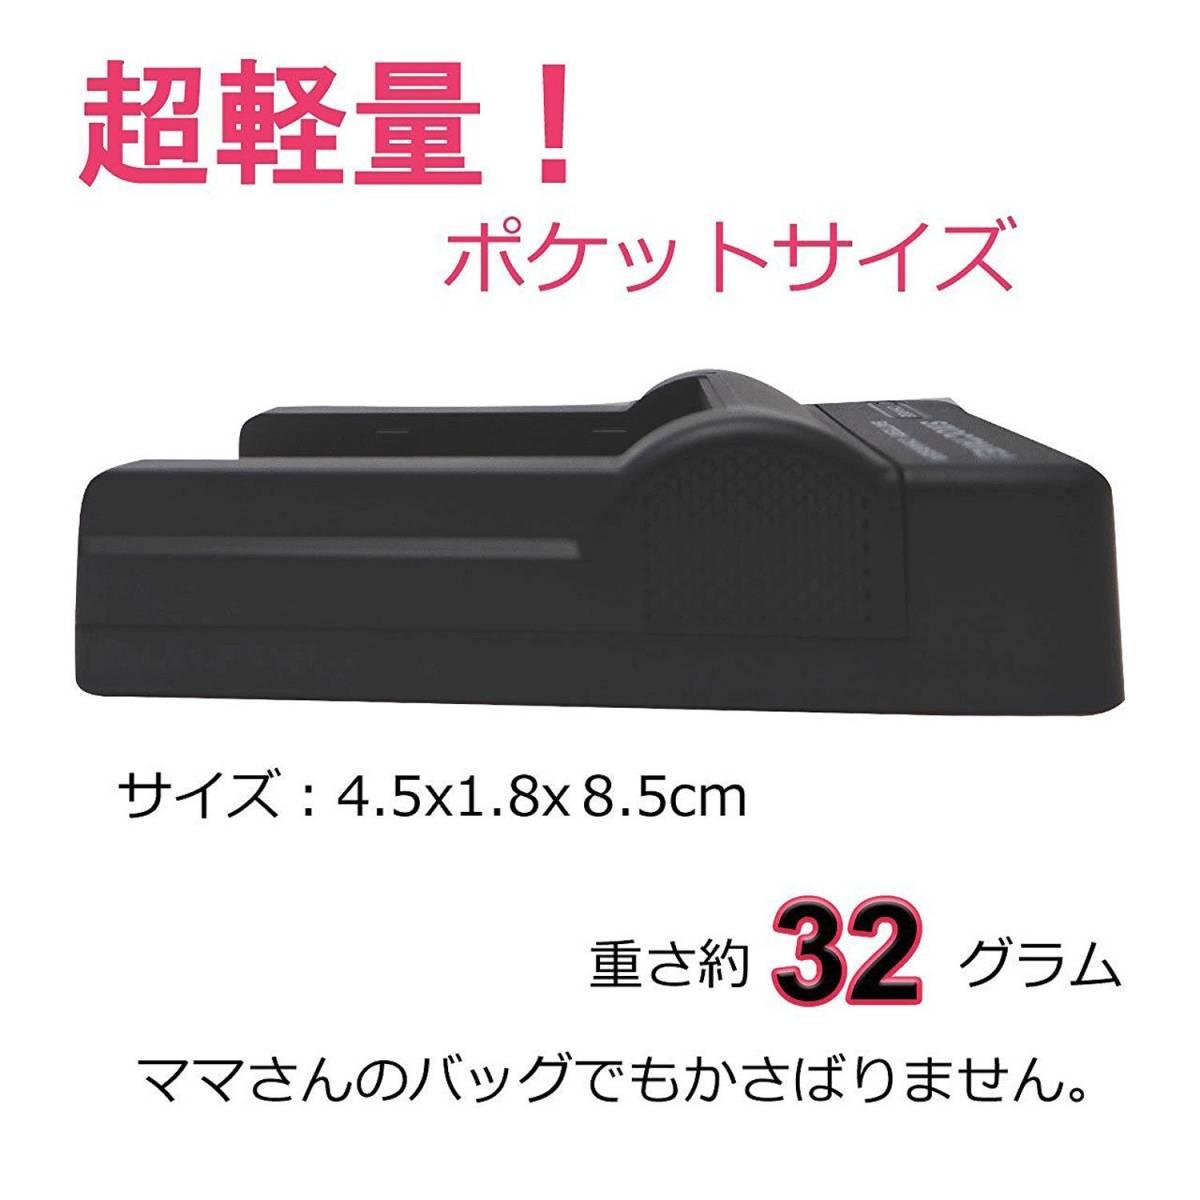 新品 NIKON ニコン EN-EL9 / EN-EL9a 互換バッテリー 2個& 急速互換充電器 USBチャージャー MH-23 D40X / D3000 / D5000 / D60 / D40_画像6